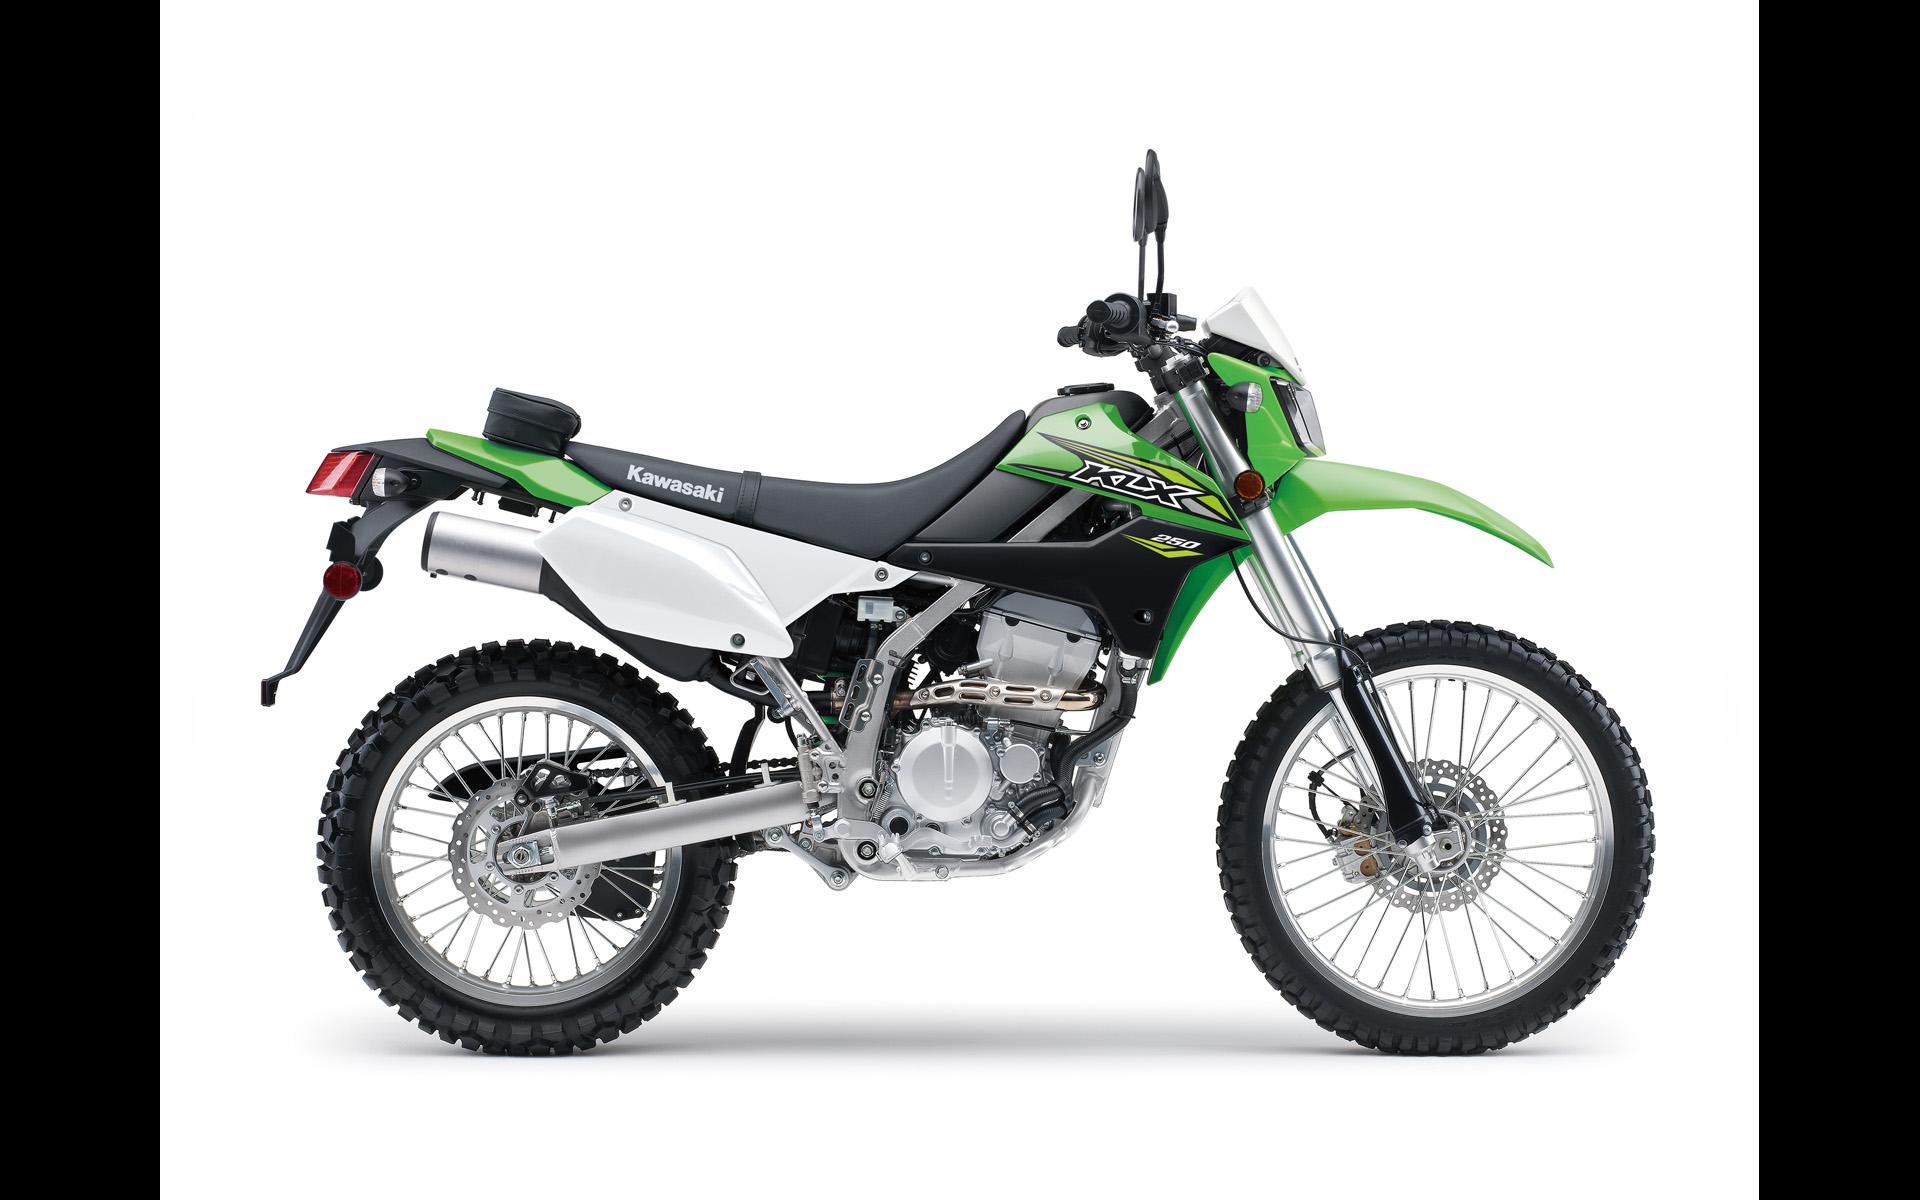 Klx 250 Motorcycle